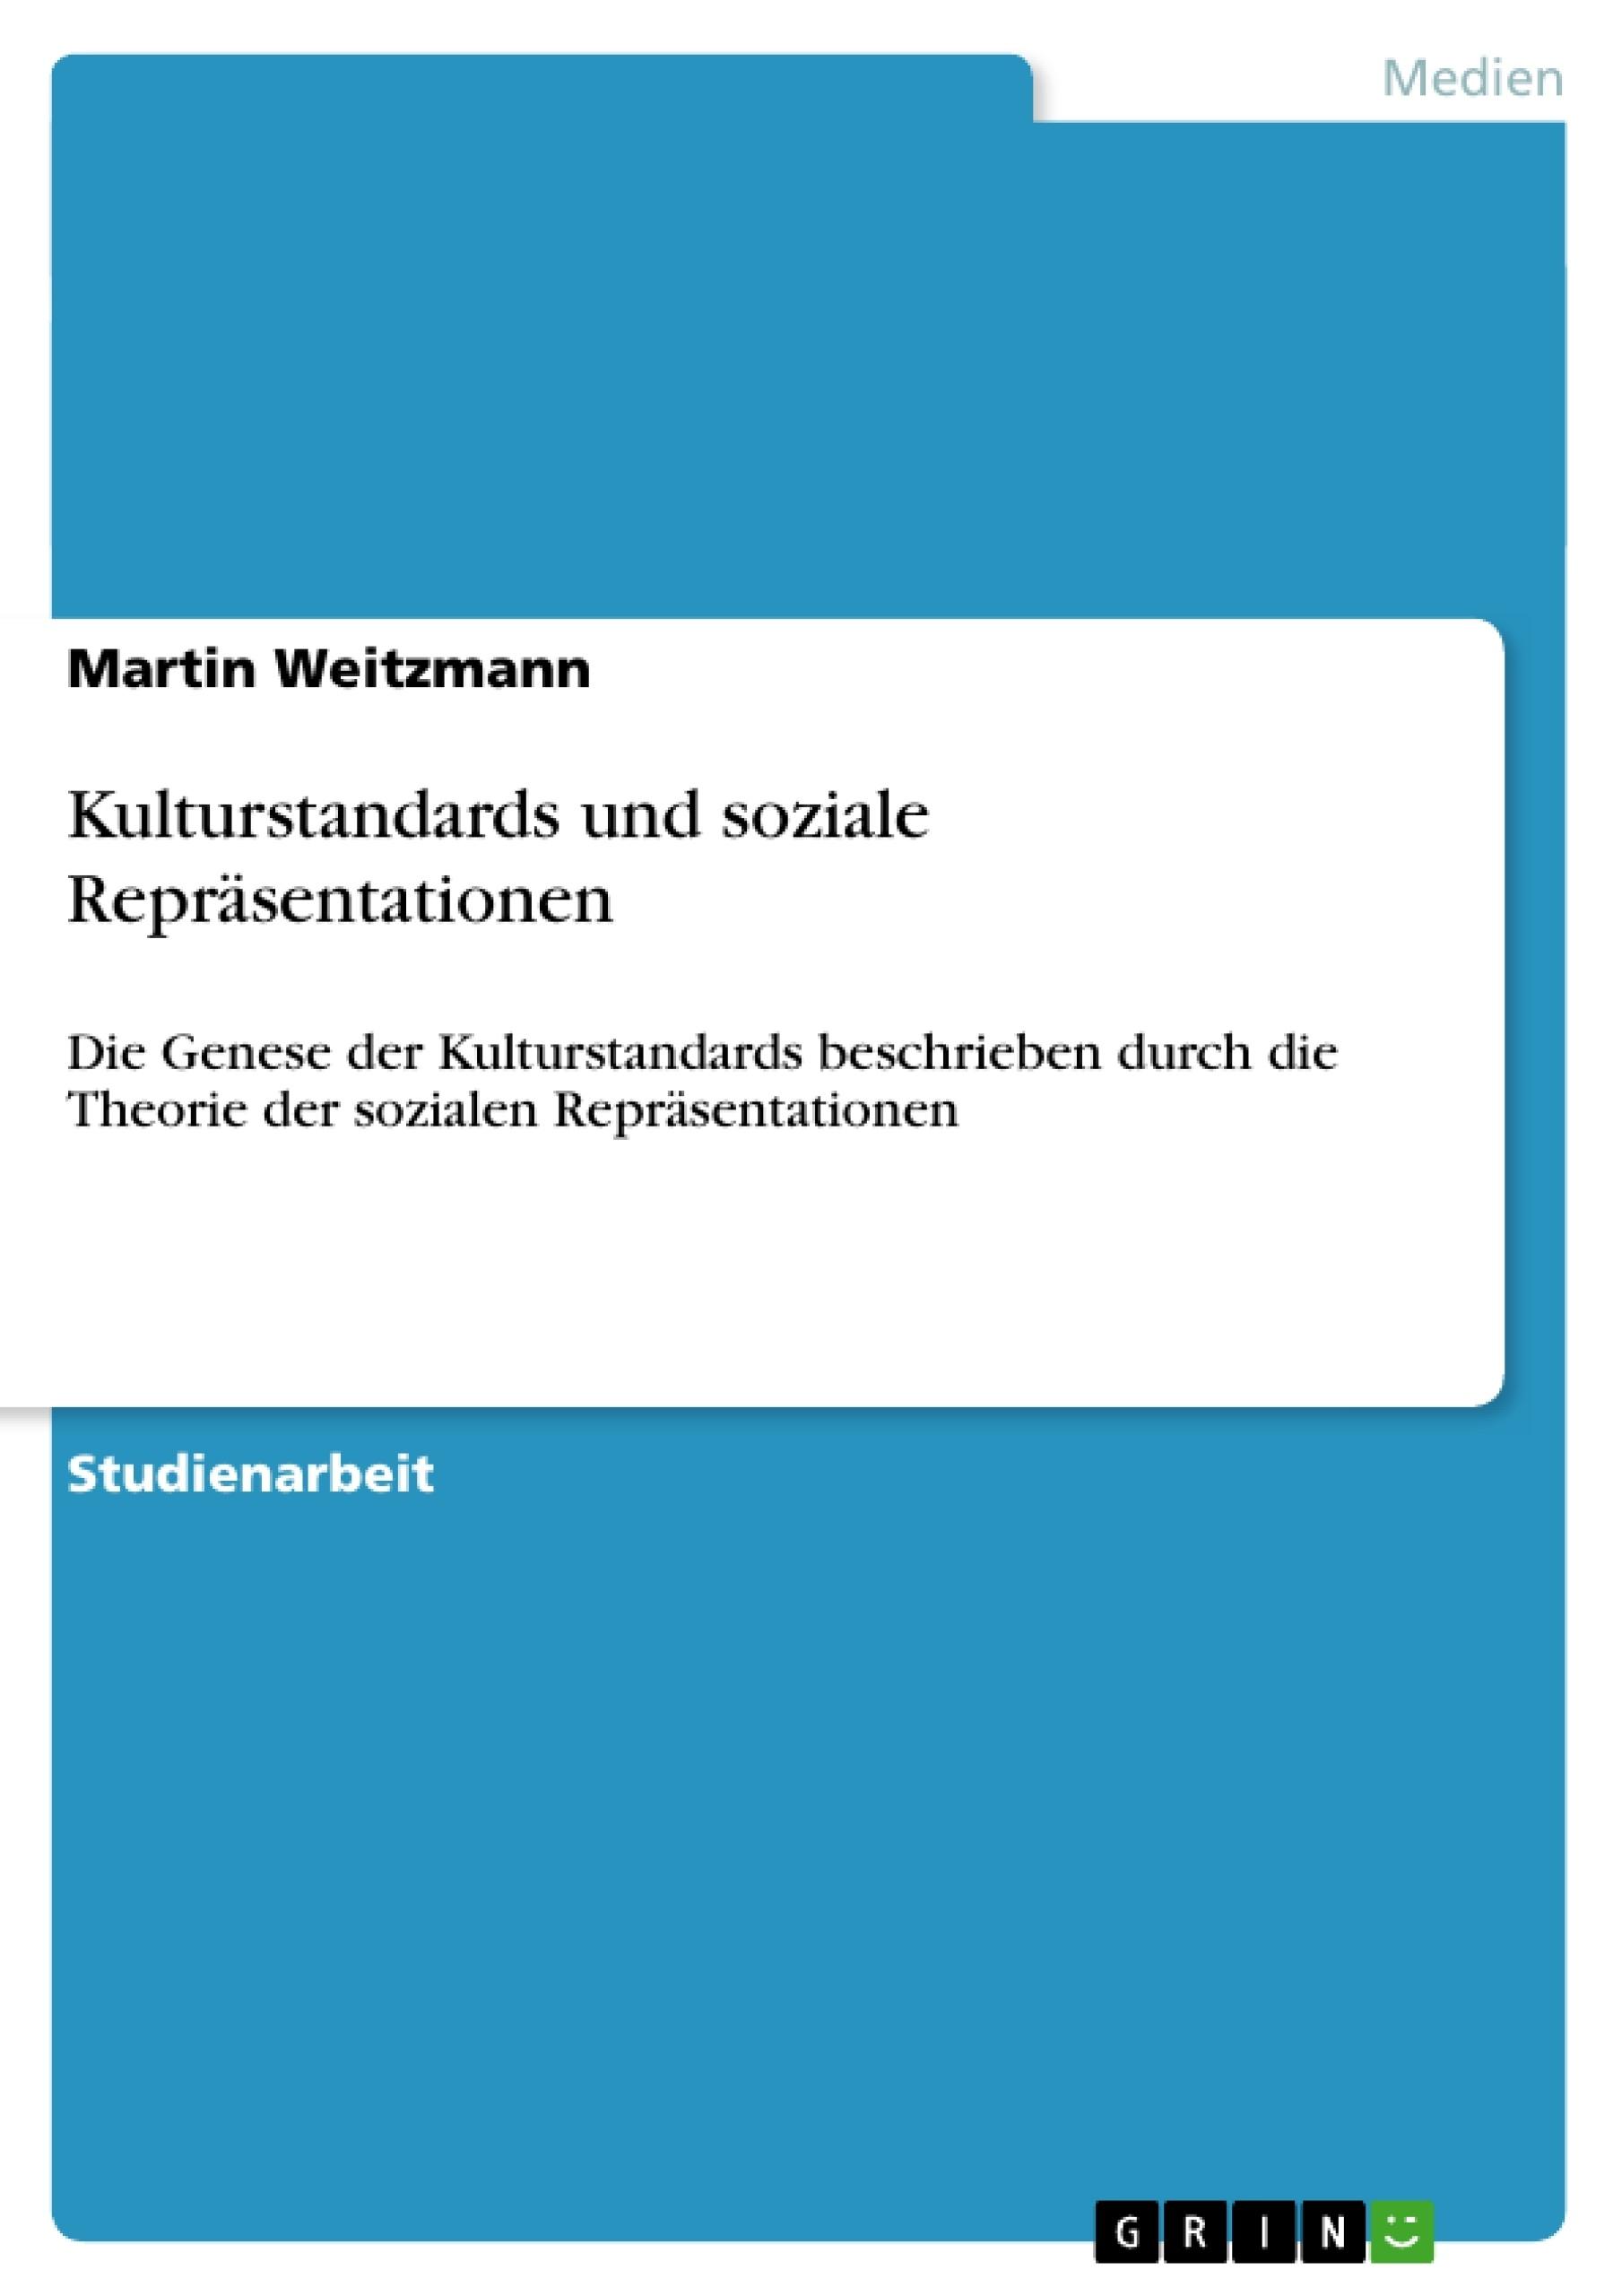 Titel: Kulturstandards und soziale Repräsentationen